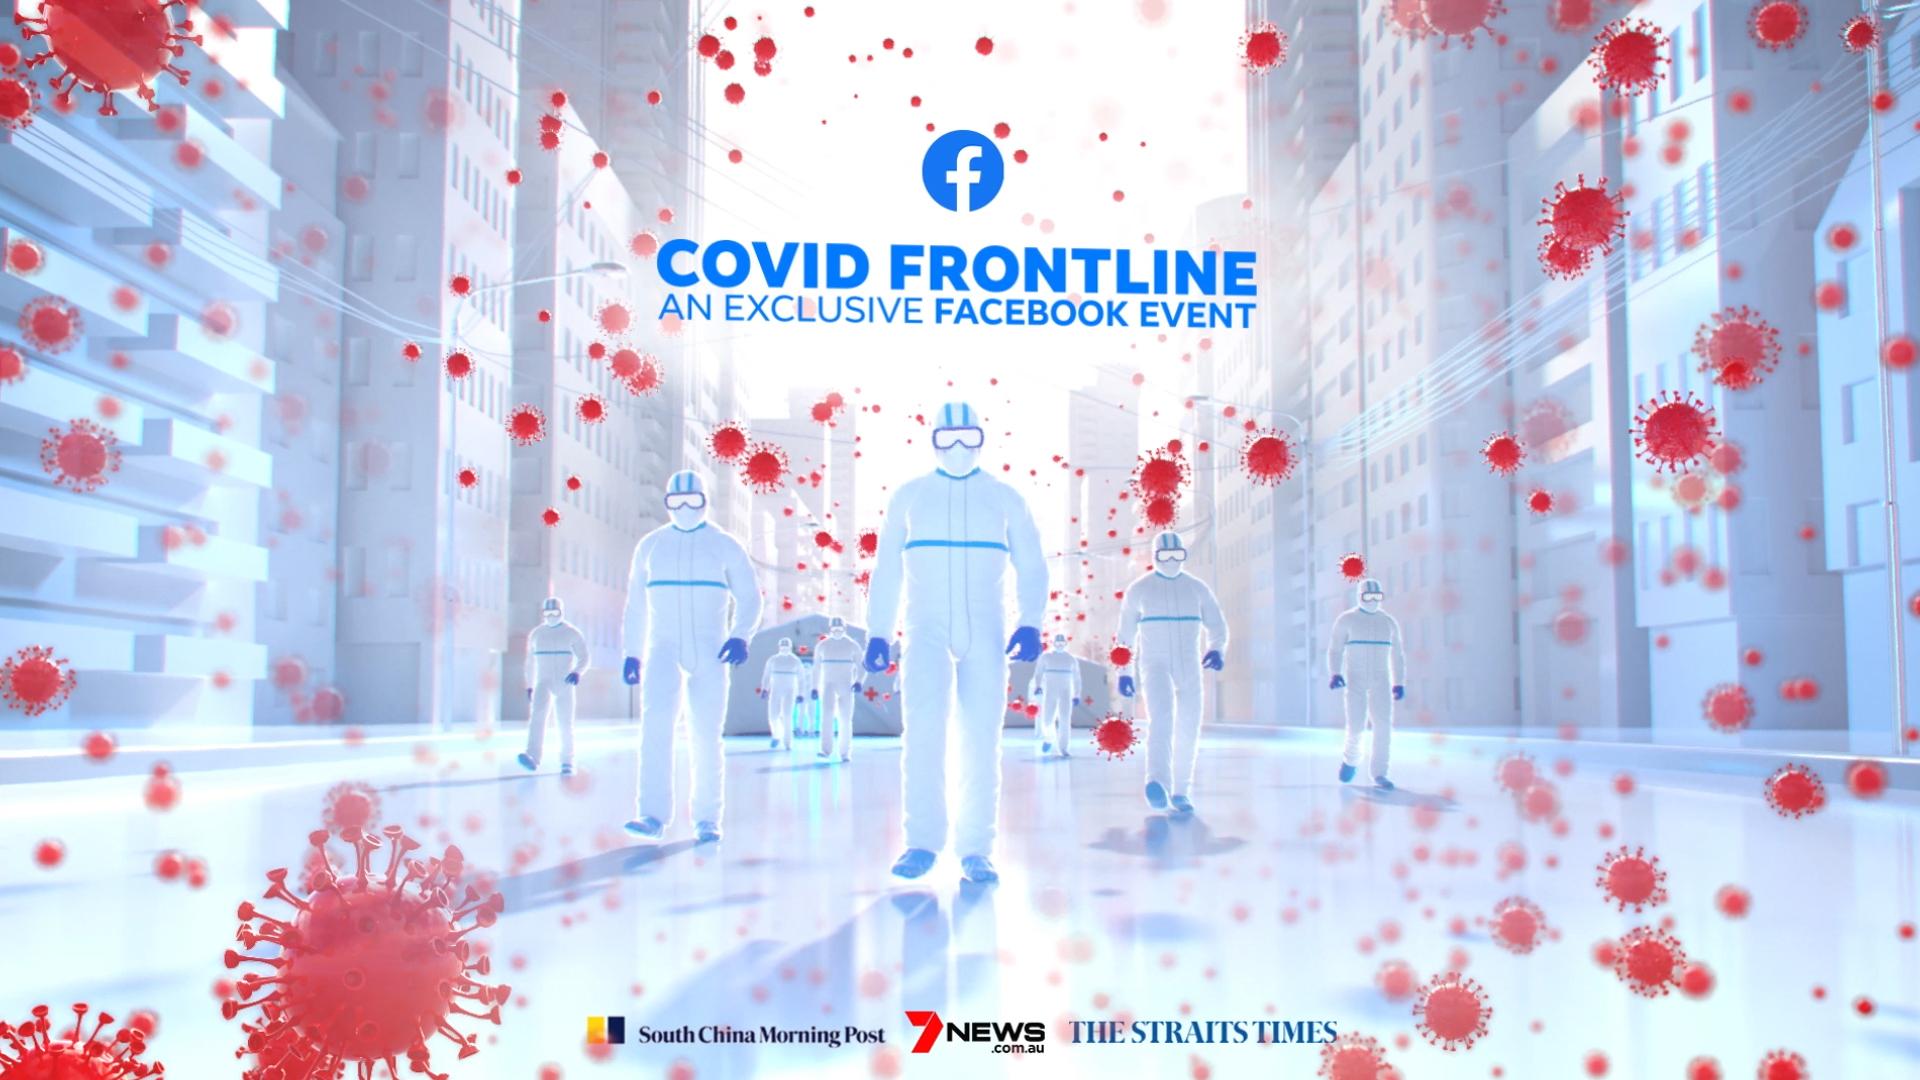 COVID Frontline